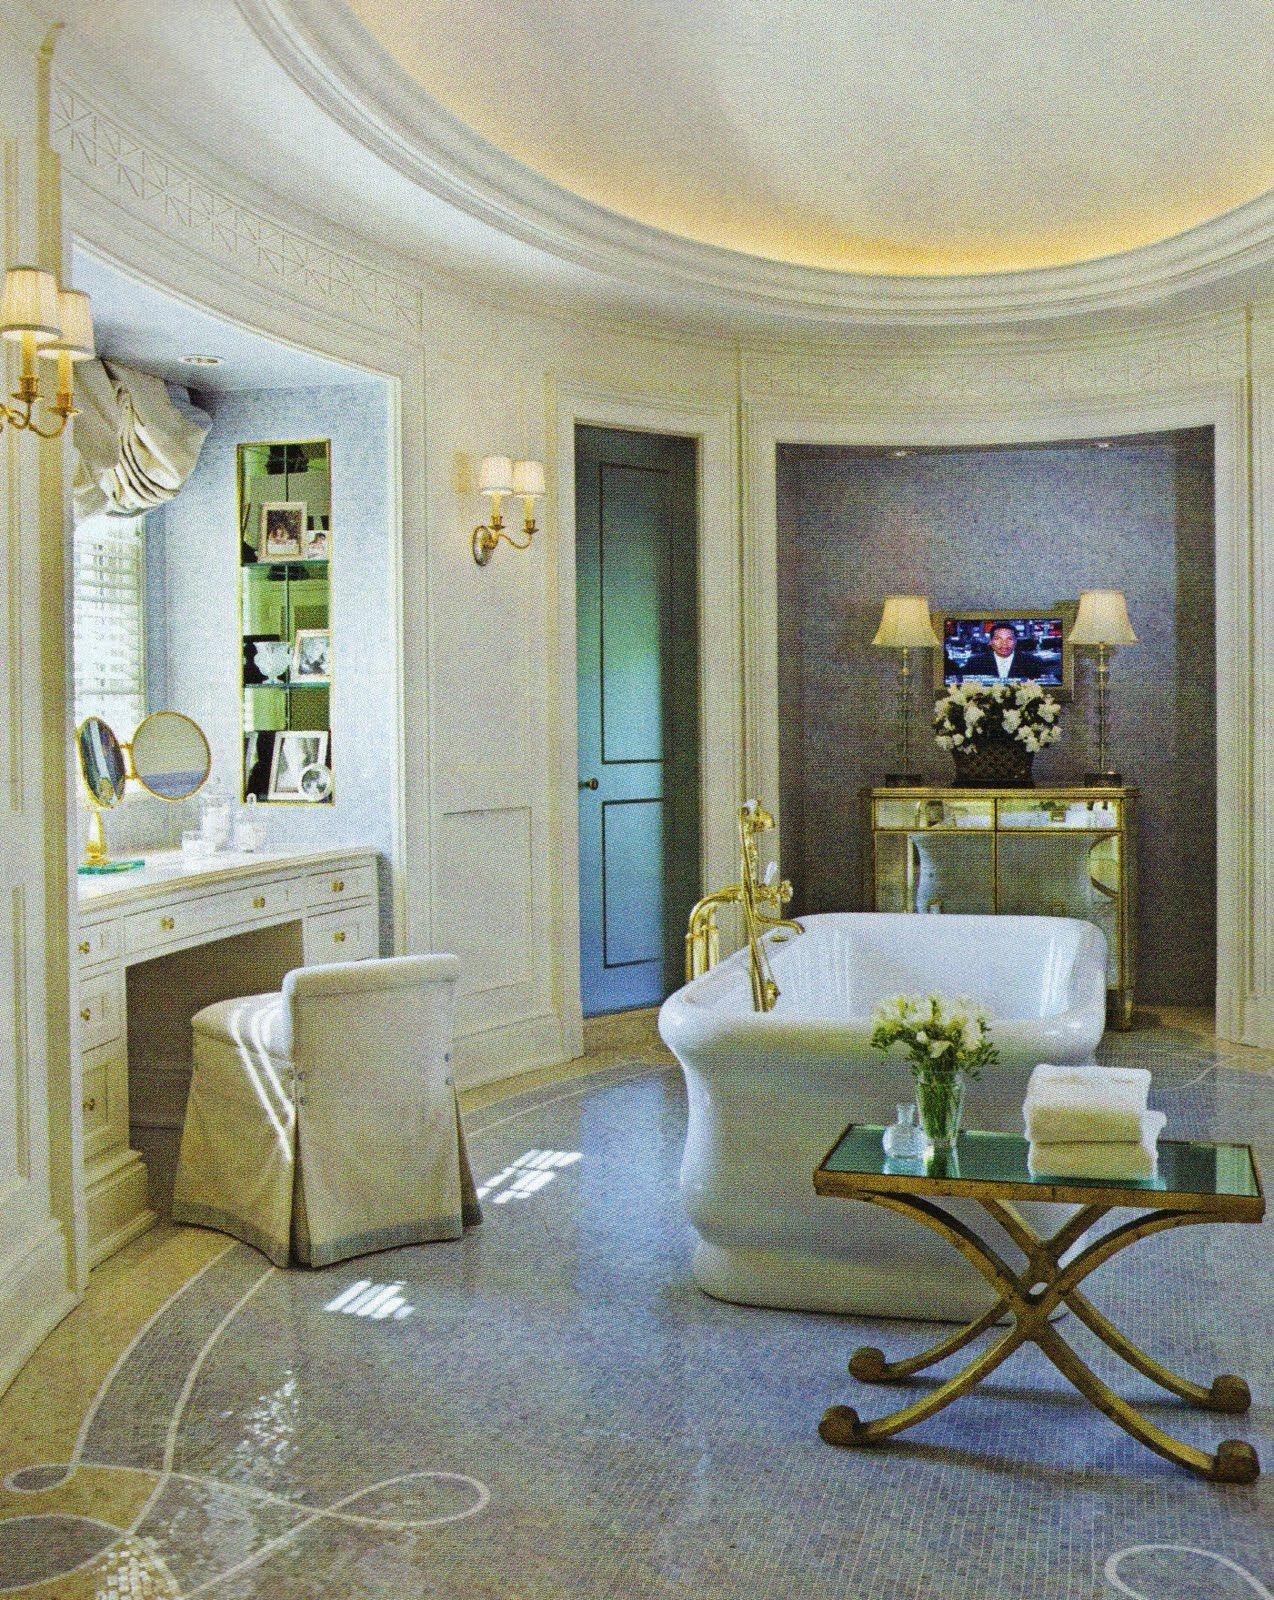 thomas pheasant interior design | Splendid Sass: THOMAS PHEASANT ~ INTERIOR DESIGNER